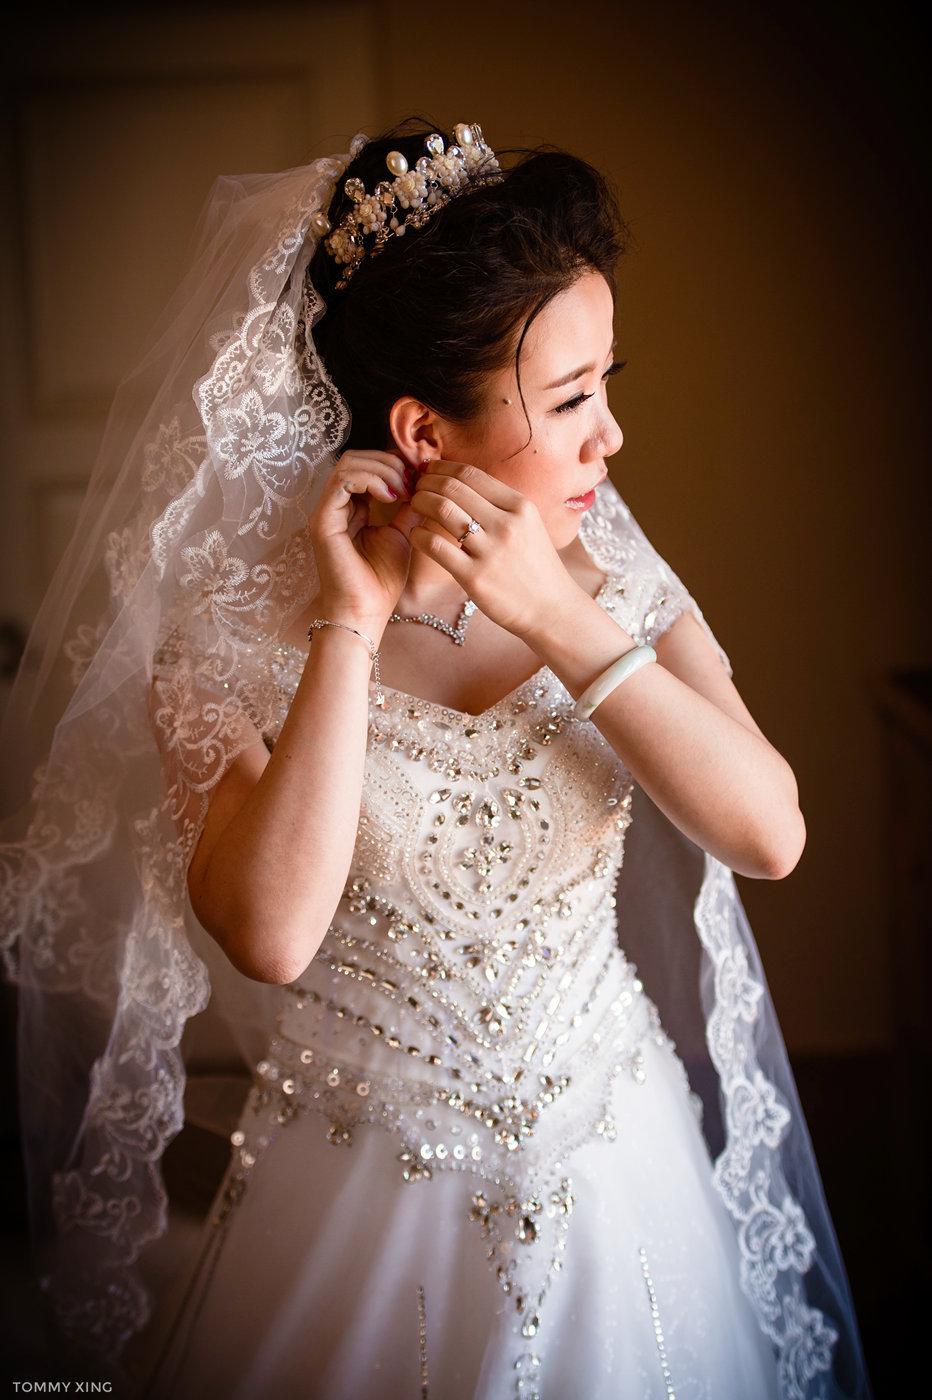 Neighborhood Church Wedding Ranho Palos Verdes Los Angeles Tommy Xing Photography 洛杉矶旧金山婚礼婚纱照摄影师 025.jpg